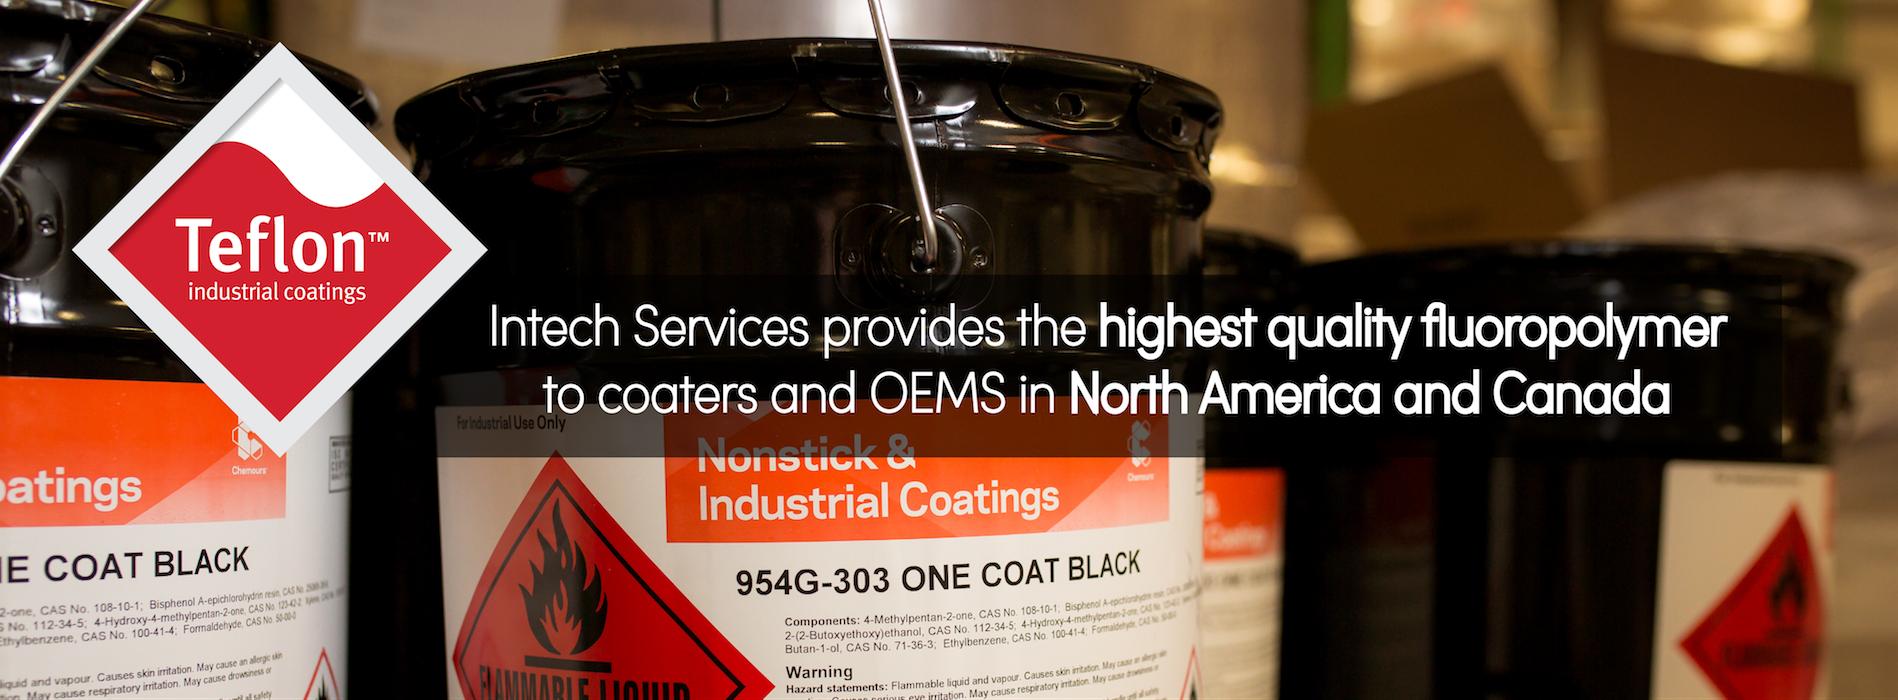 Intech Services, Inc  | Sole Distributor of Teflon™ Coatings